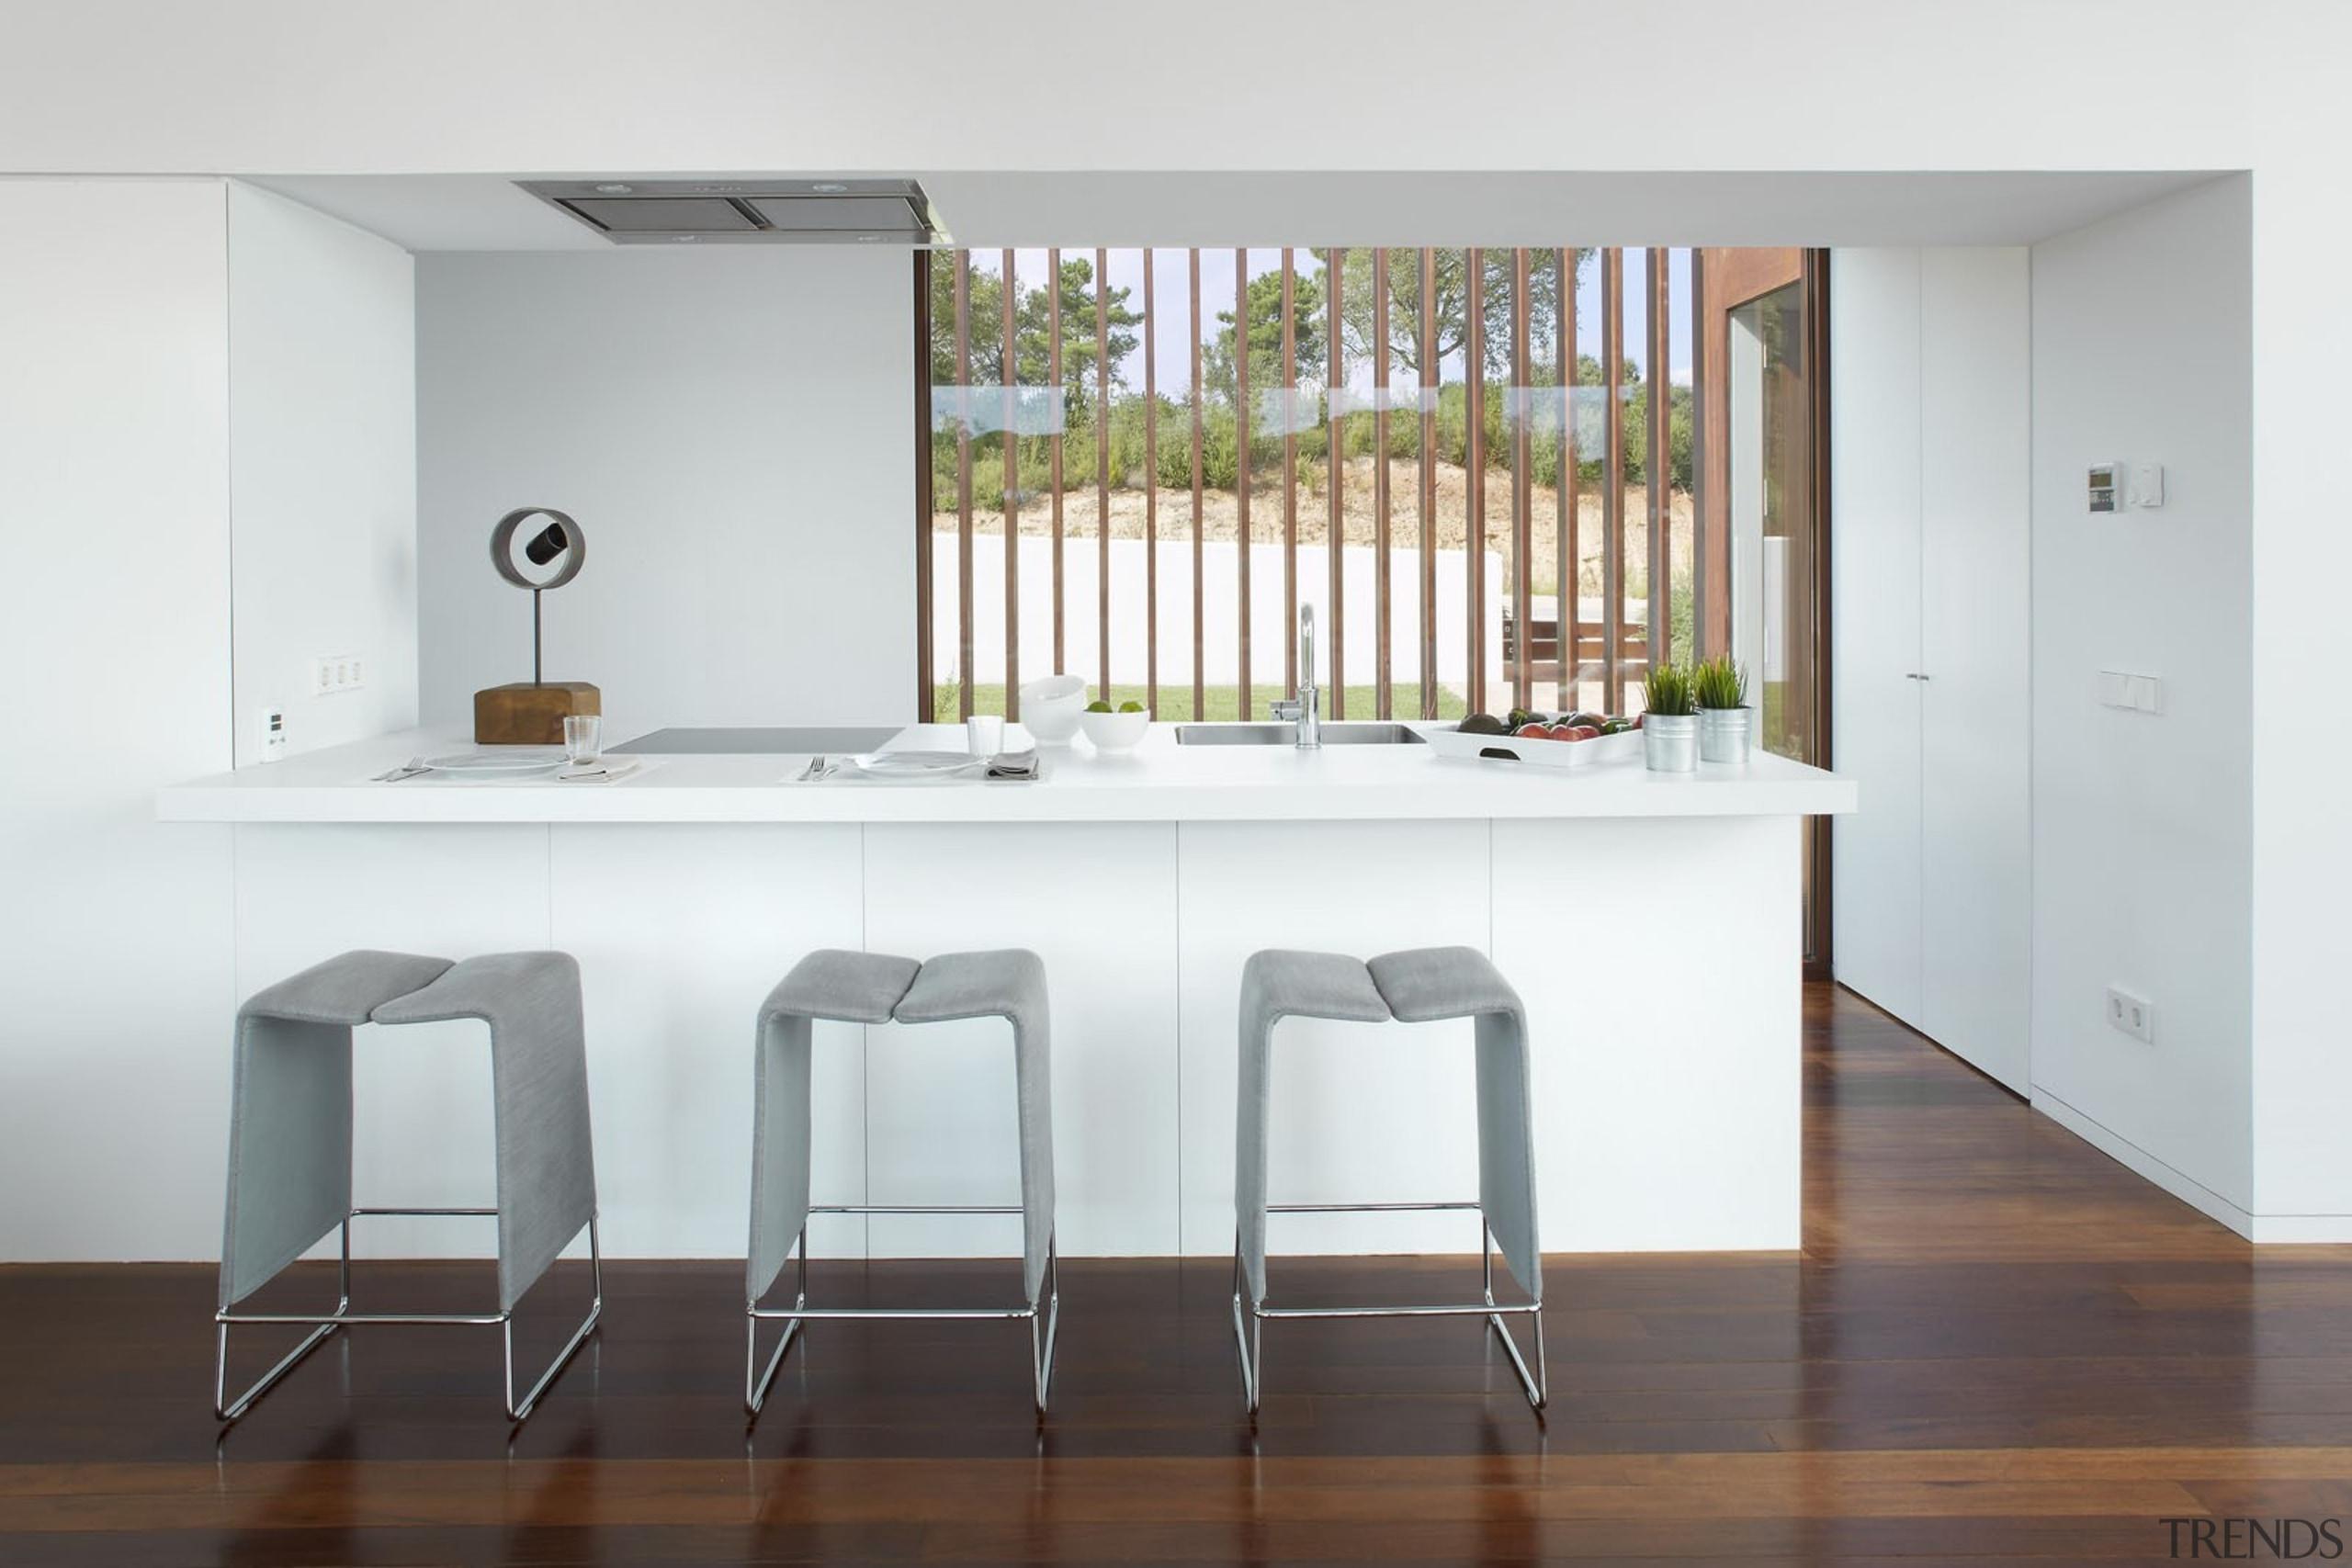 Blanco Zeus Extreme (1) 9 - Blanco Zeus architecture, floor, flooring, furniture, house, interior design, product design, real estate, table, wall, white